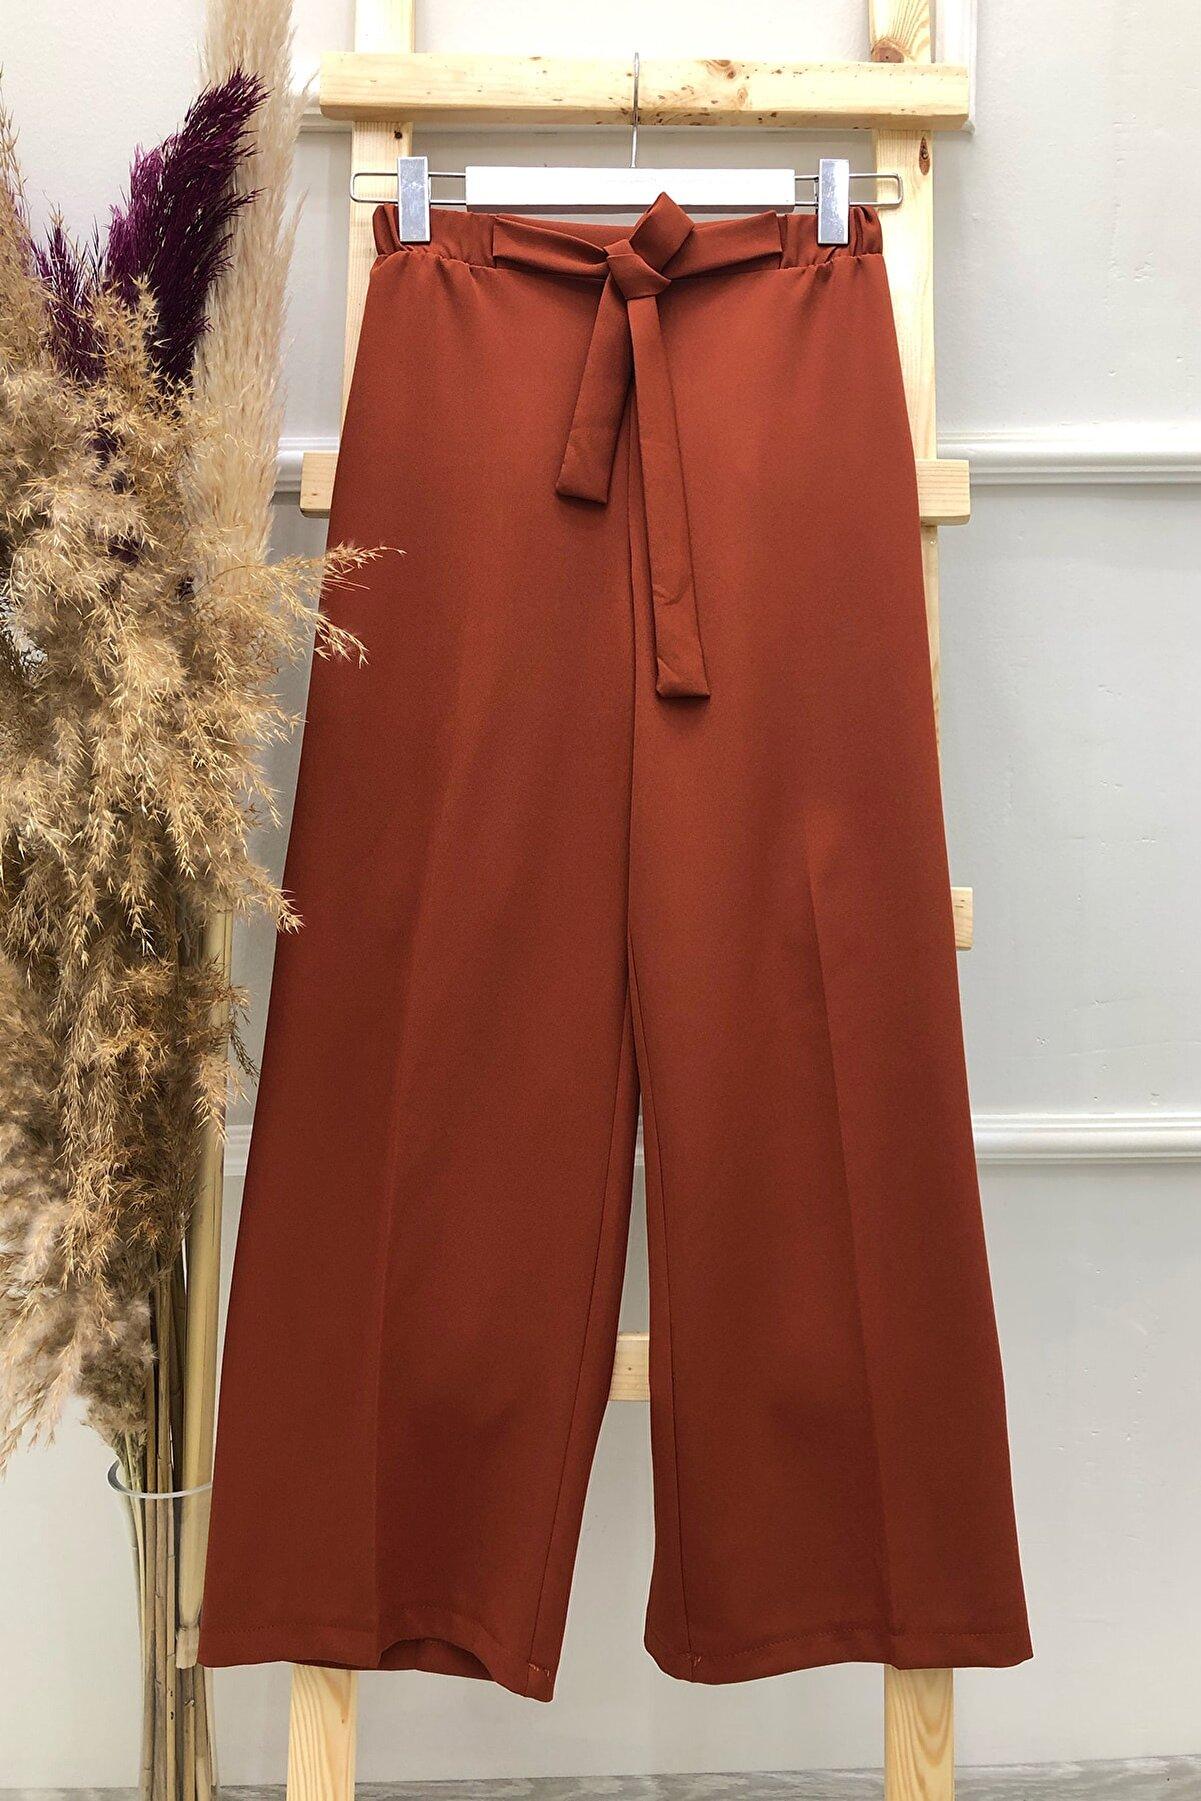 MODAQU Kadın Kiremit Kuşaklı Bol Paça Pantolon